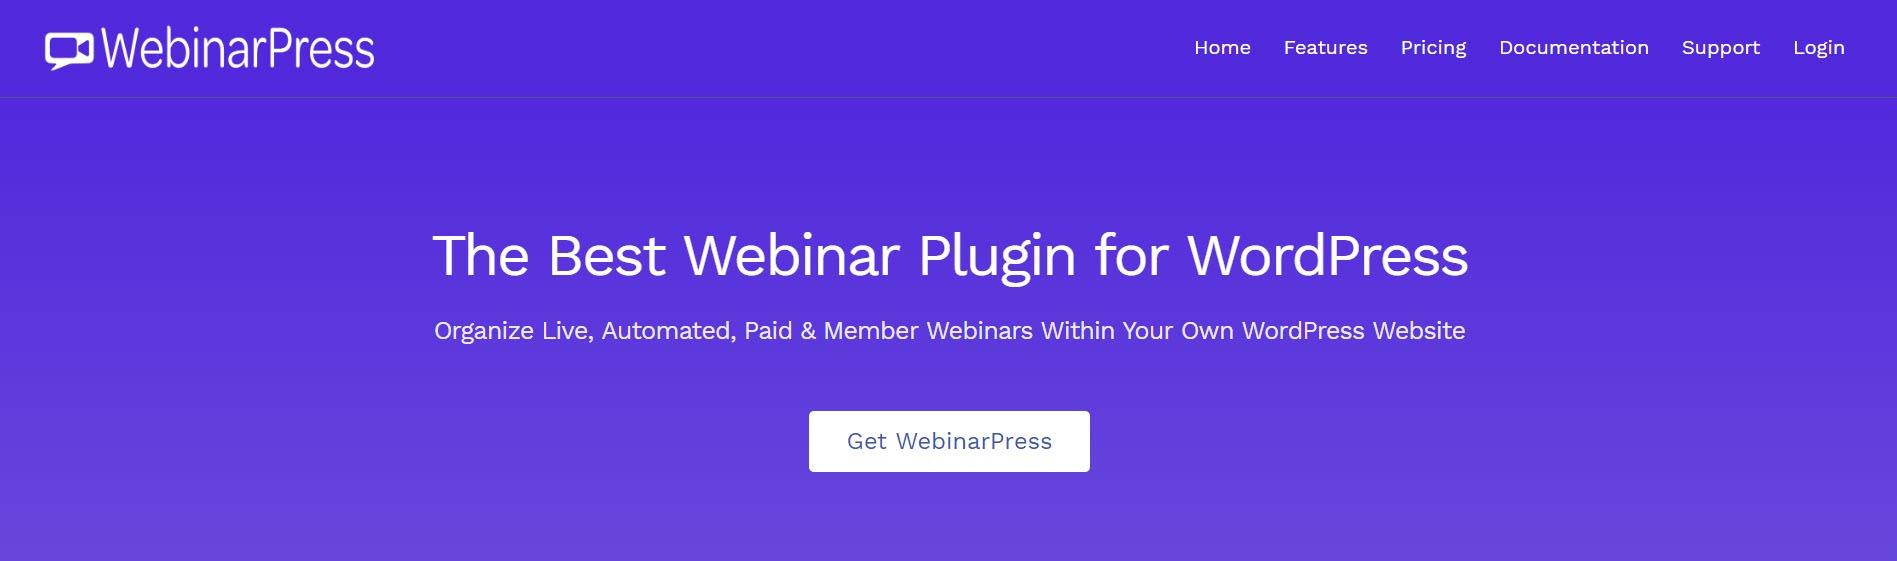 WebinarPress